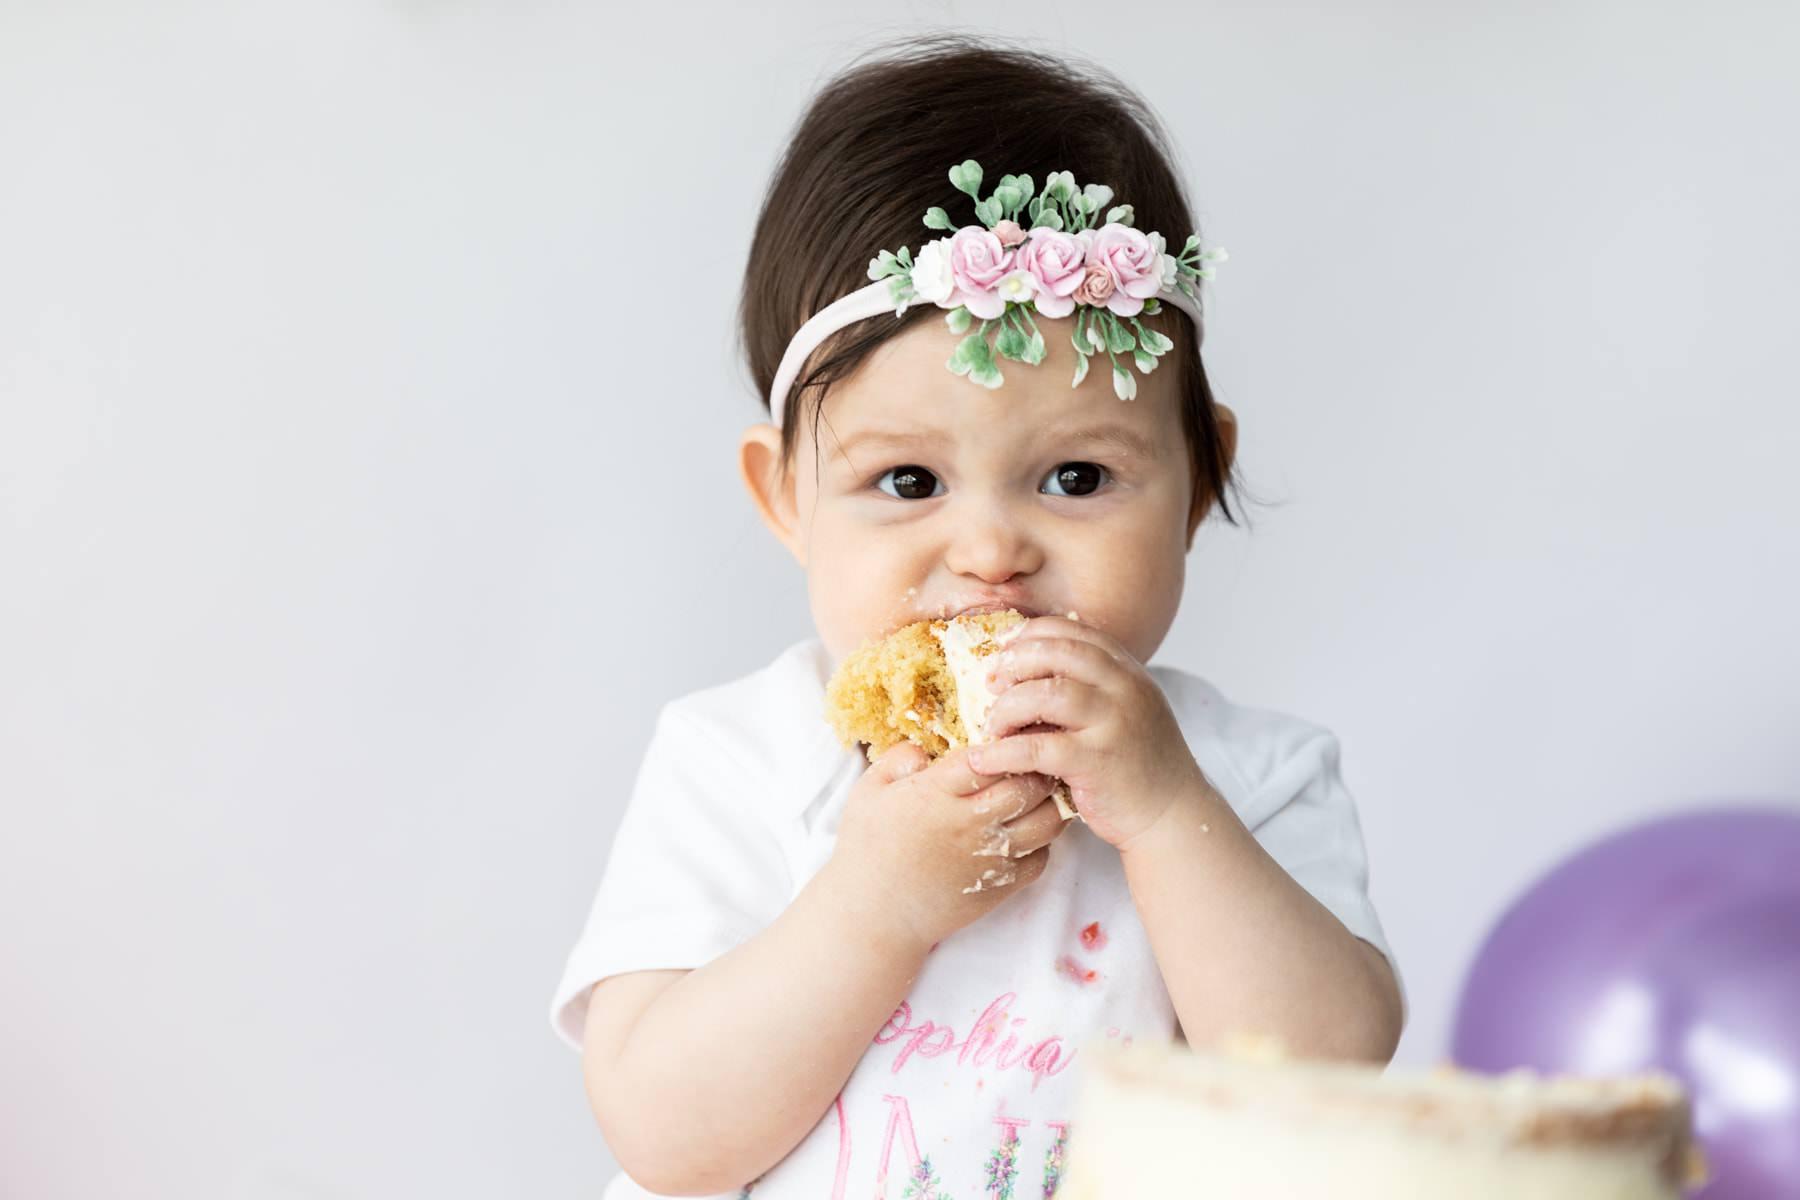 little girl wearing pink flower headband eating cake at her Kent cake smash photoshoot in Bexley